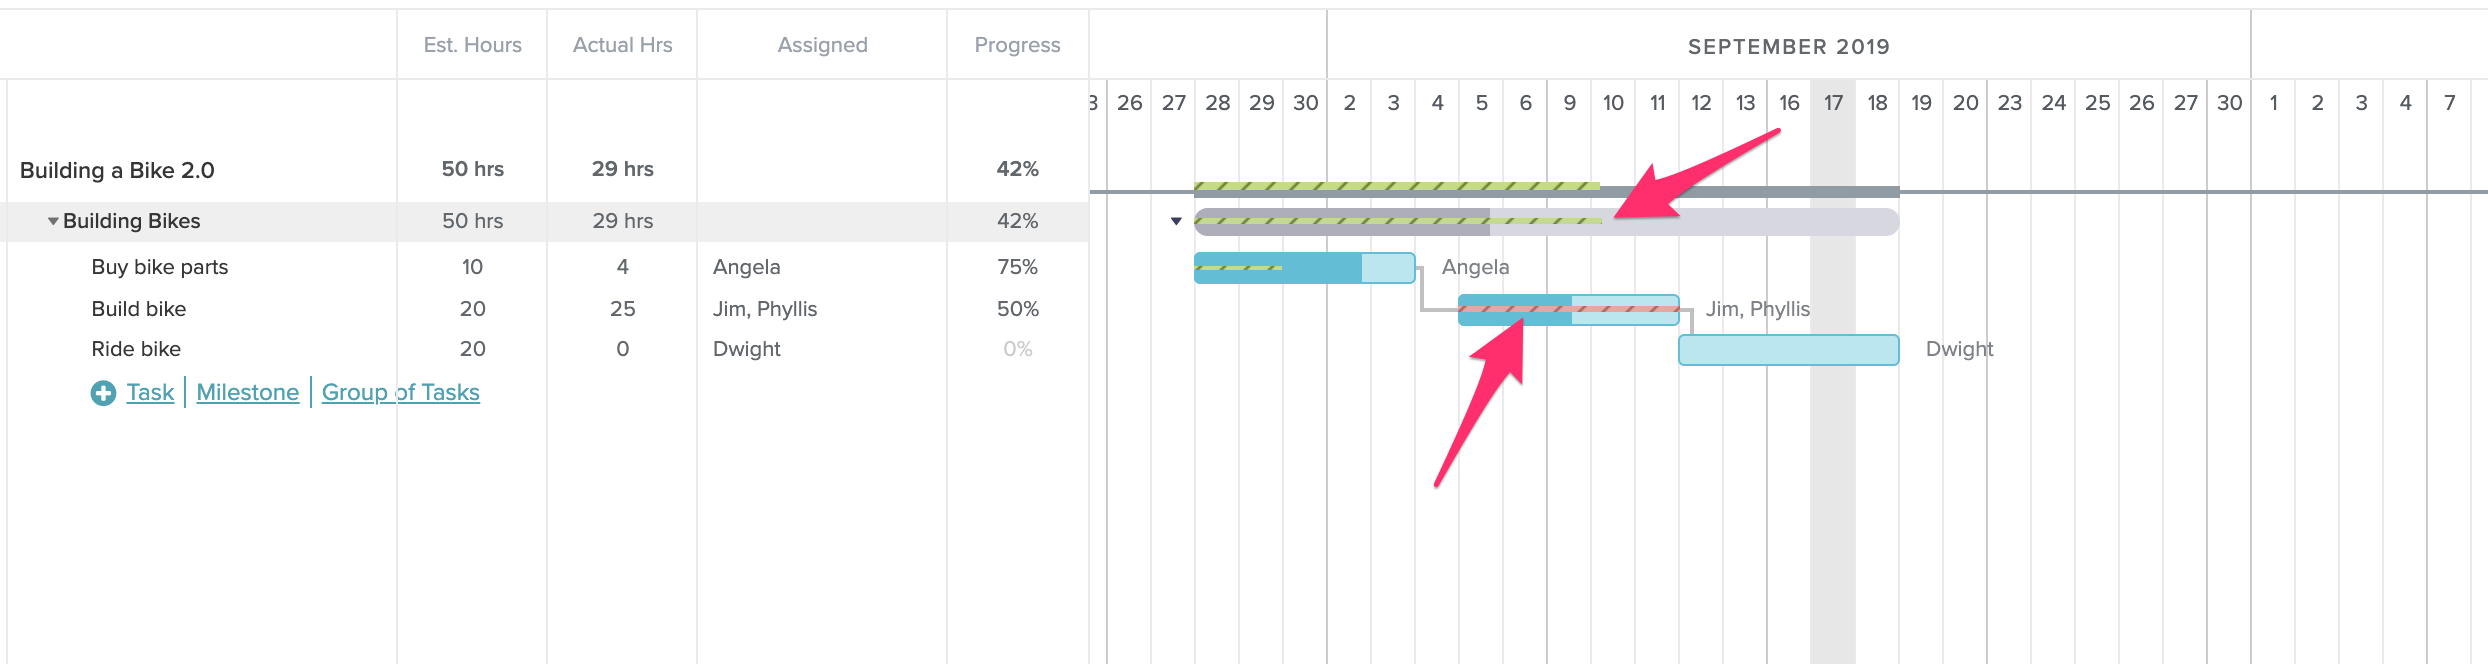 Actual progress made versus estimated hours in TeamGantt